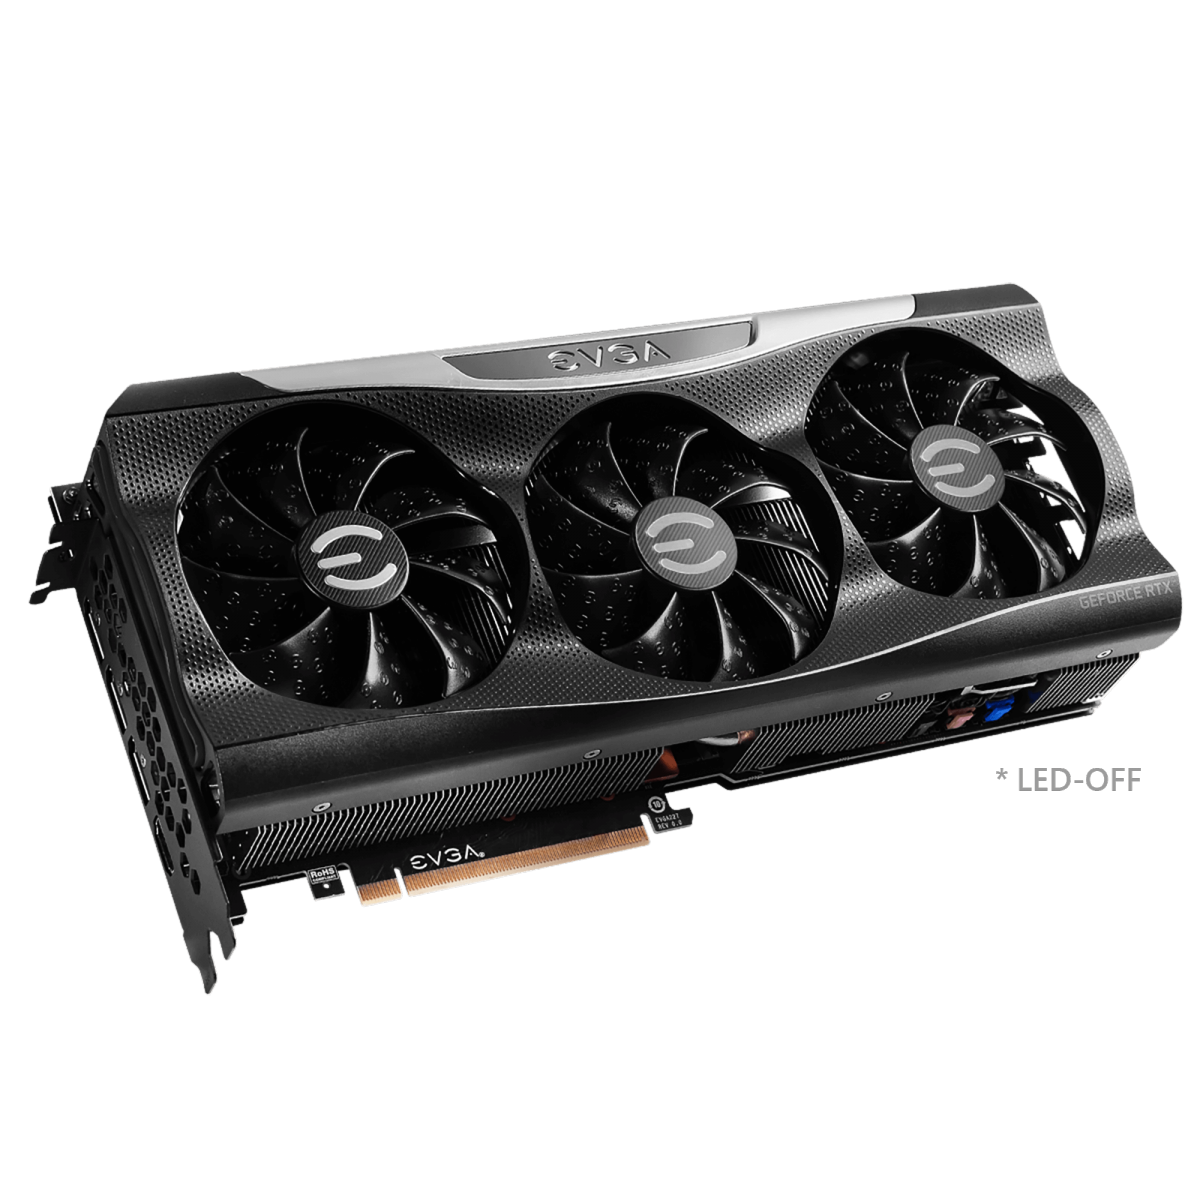 Placa de Vídeo EVGA GeForce RTX 3080 FTW3 ULTRA GAMING, 10GB, GDDR6X, 320bit, 10G-P5-3897-KR